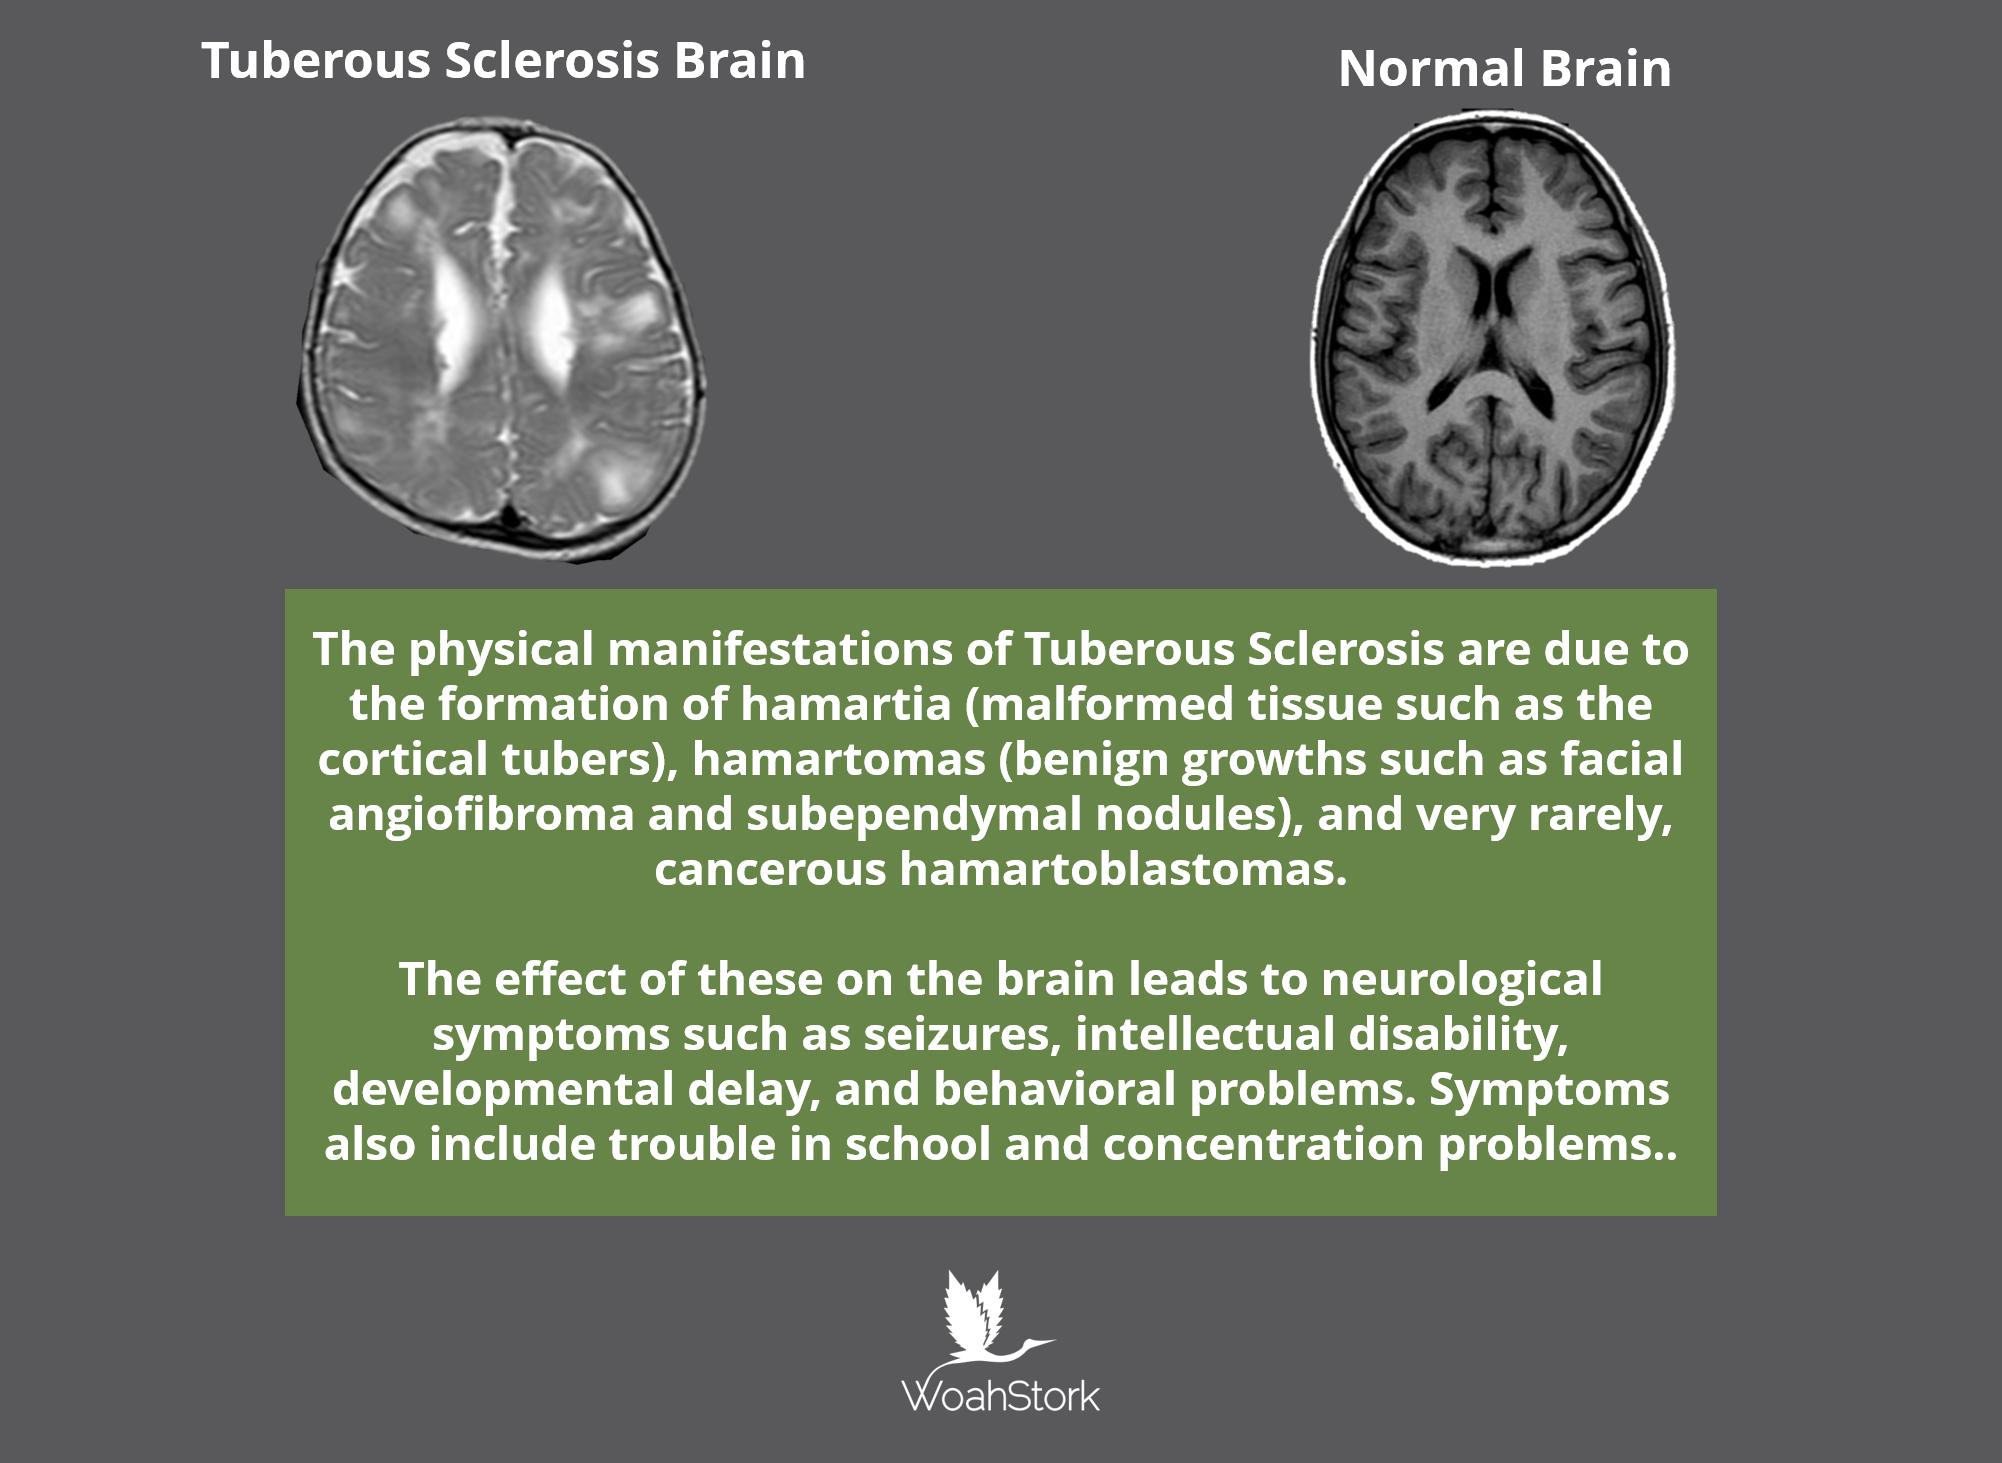 epidiolex for tuberous sclerosis